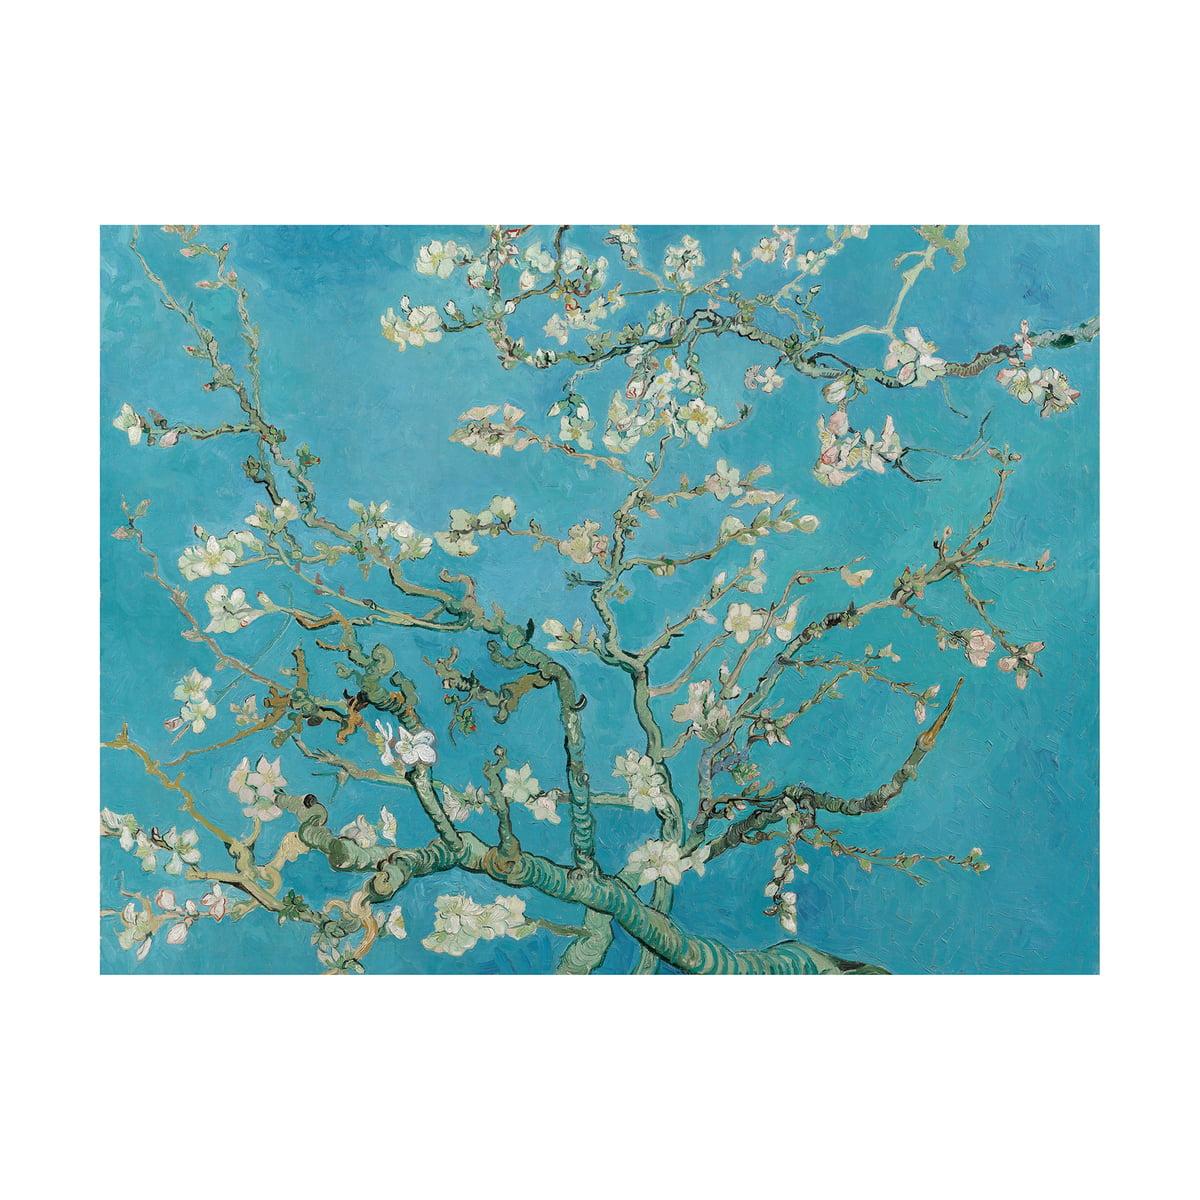 Almond Blossom (Van Gogh) by IXXI for Almond Blossom Van Gogh Poster  75tgx